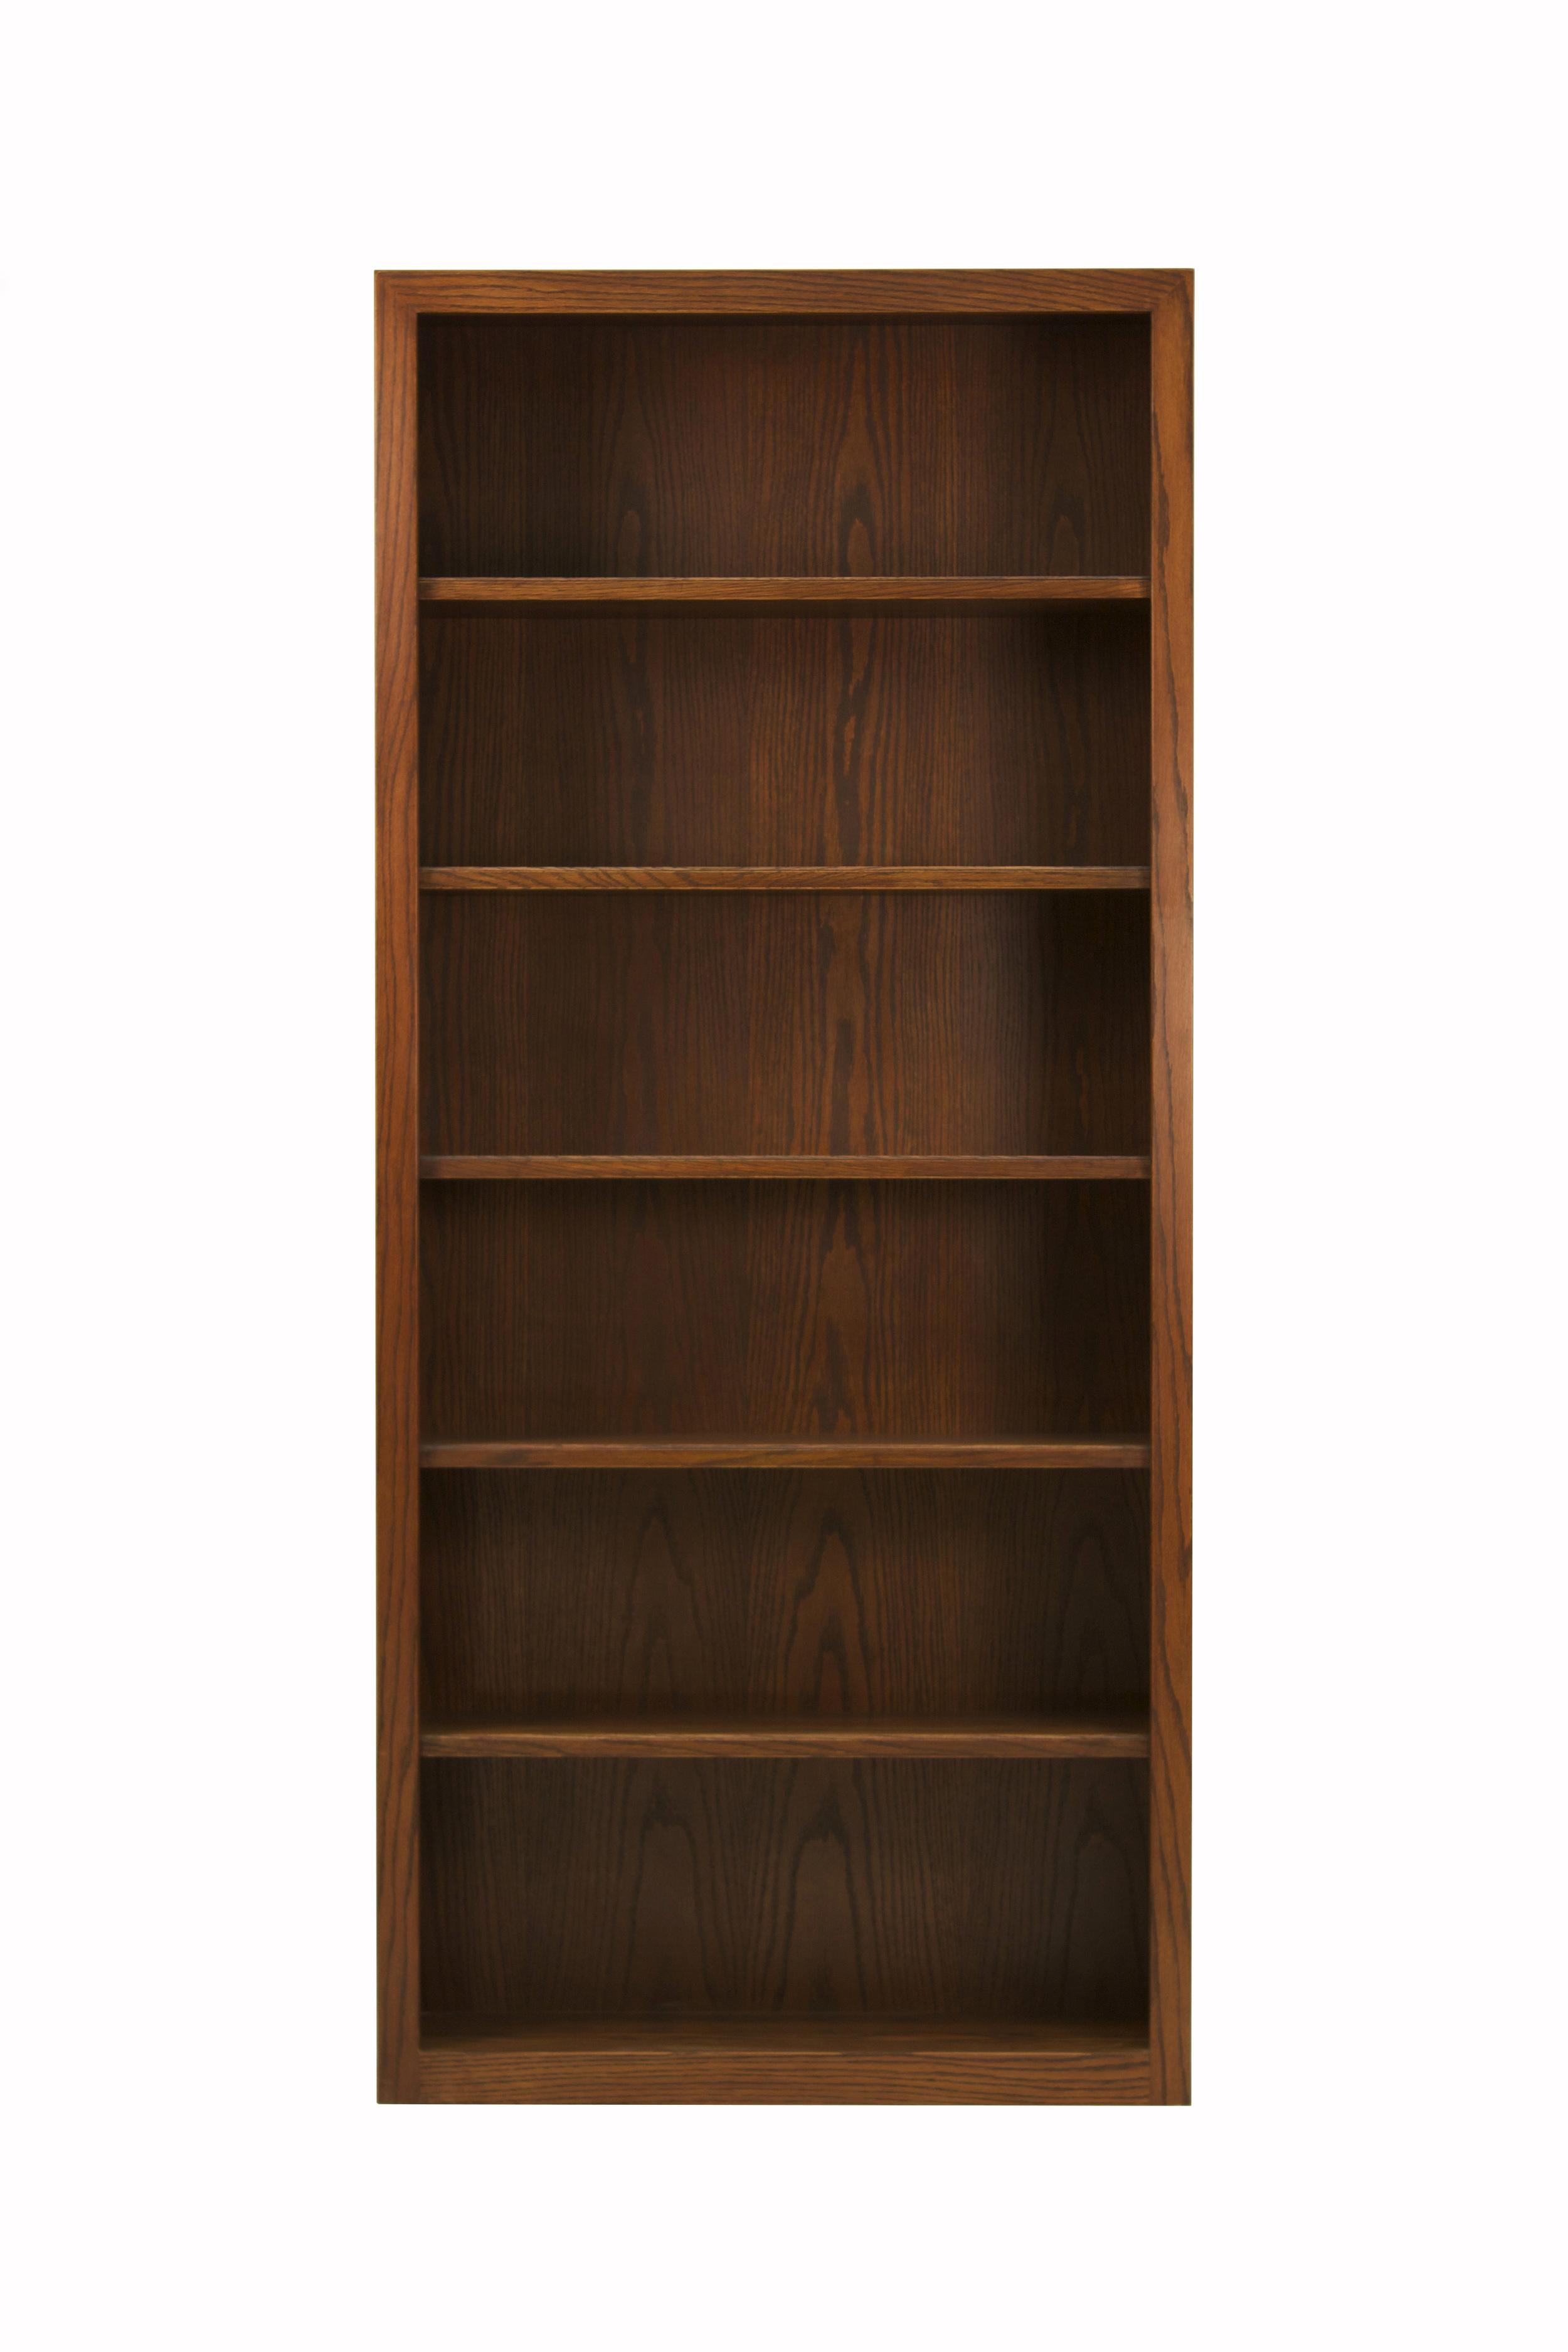 Finishing Red Oak Furniture